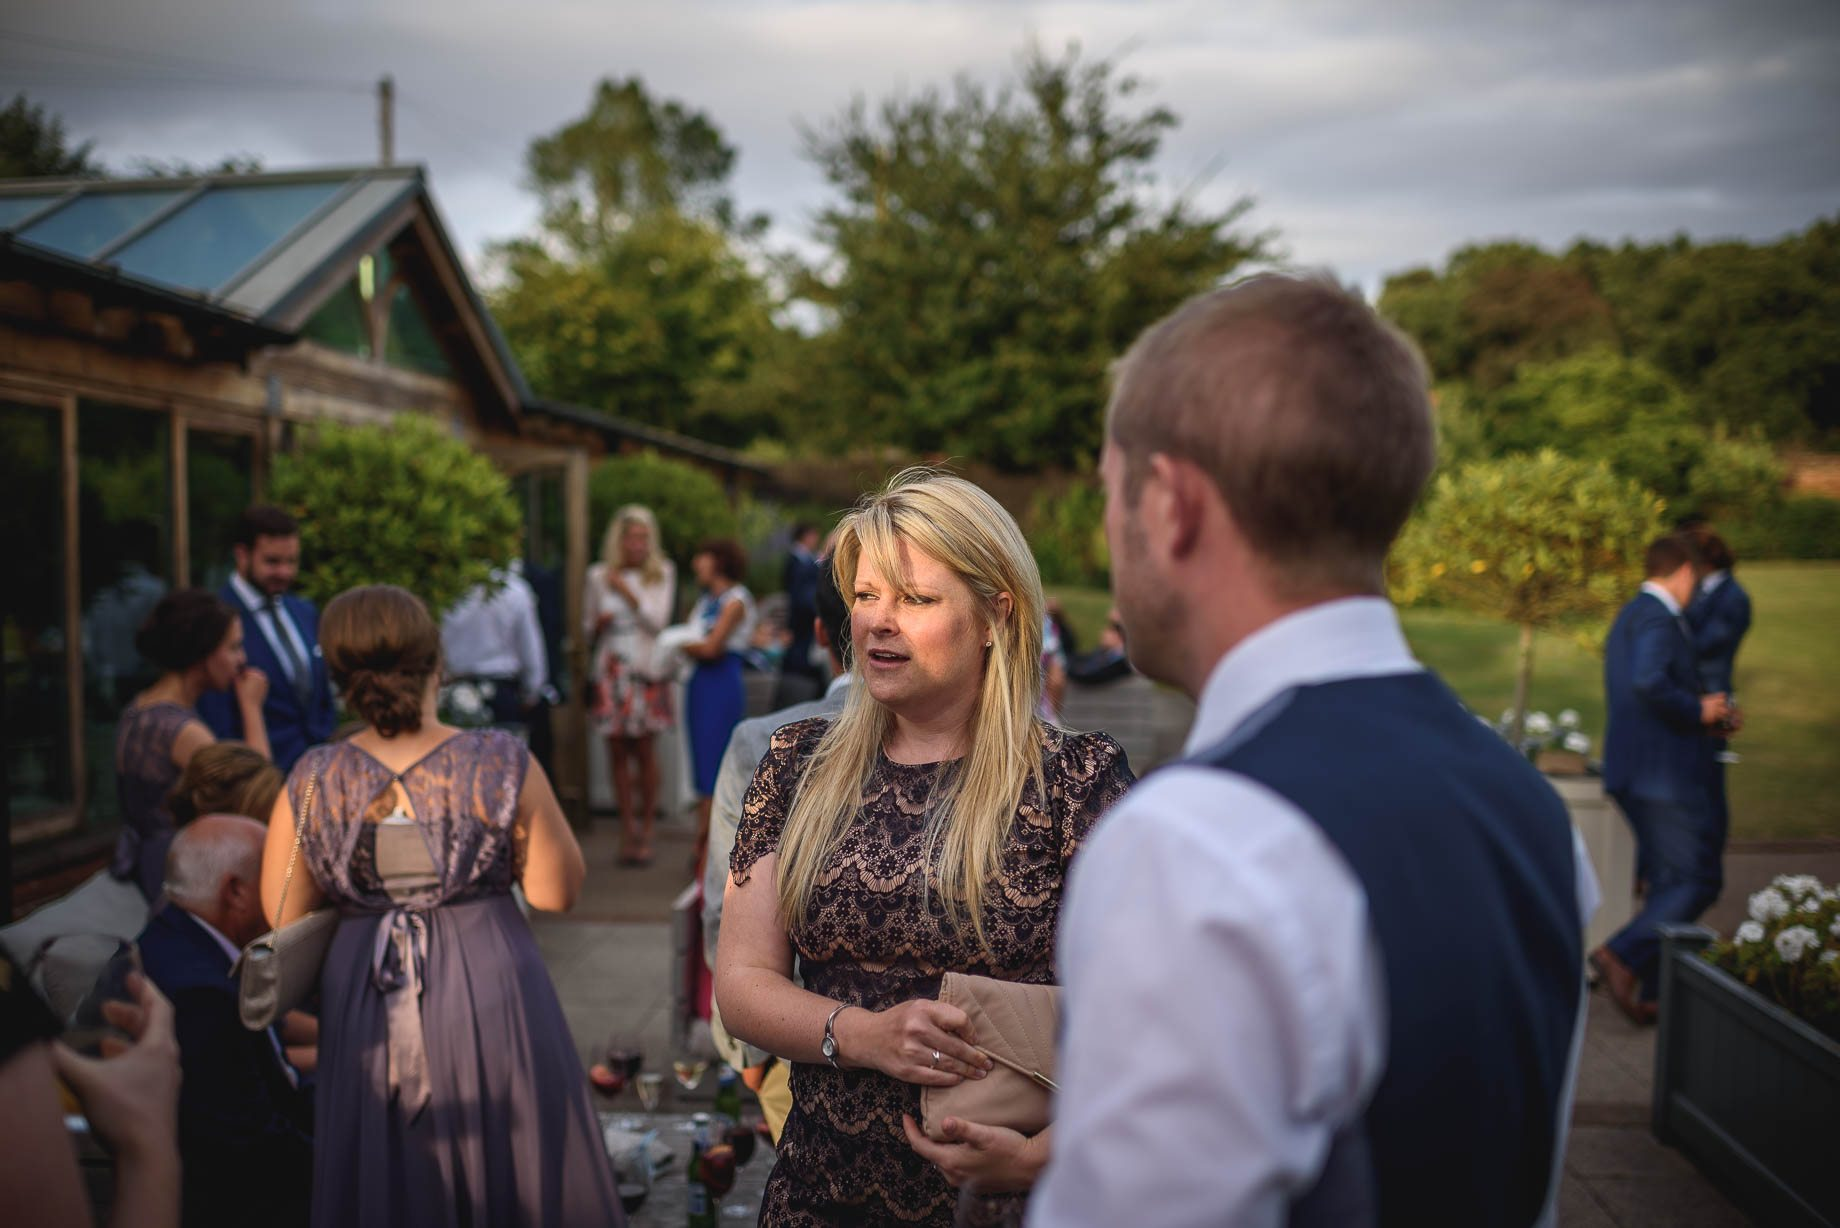 Gaynes Park wedding photography - Guy Collier Photography - Rachel and Jon (156 of 169)